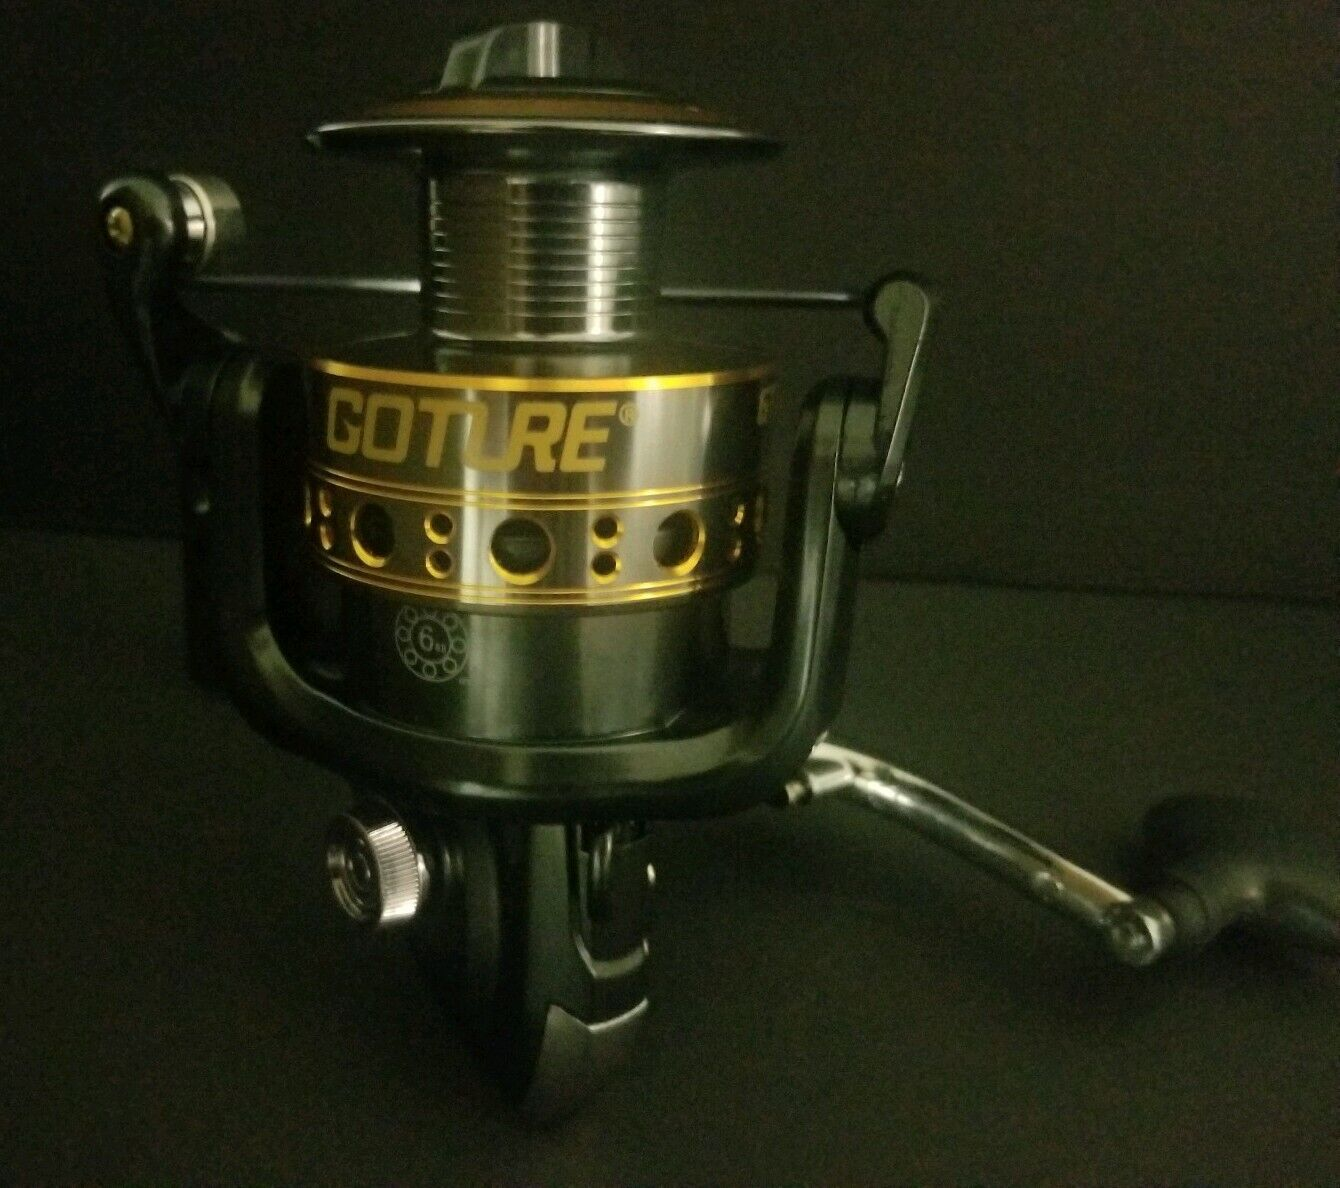 Goture Spinning Fishing Reel GT 7000 V. Gear Ratio 4.7 1 BB 6+1